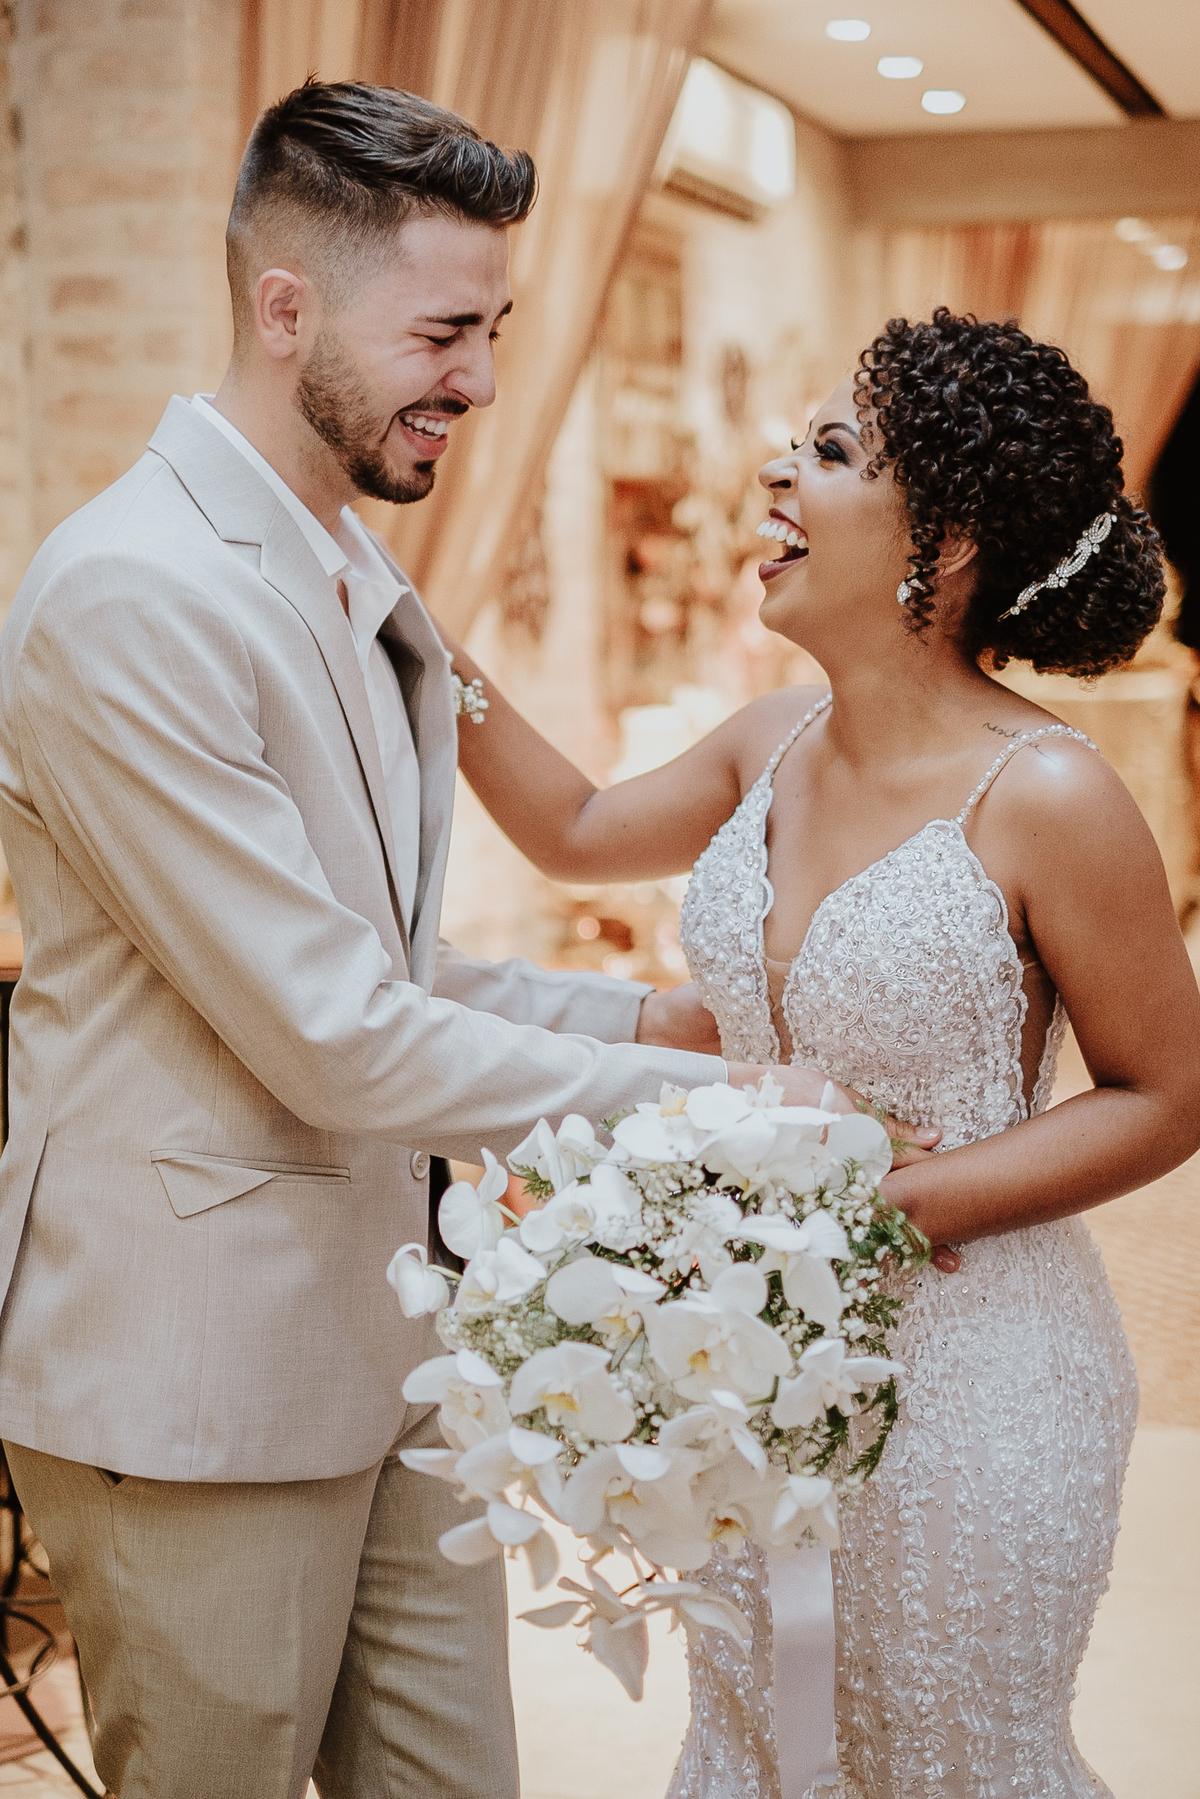 casamentos boho chic intimista na casa quena entrada da noiva vestido de noiva fotografia de casamento por caio henrique noiva sorrindo